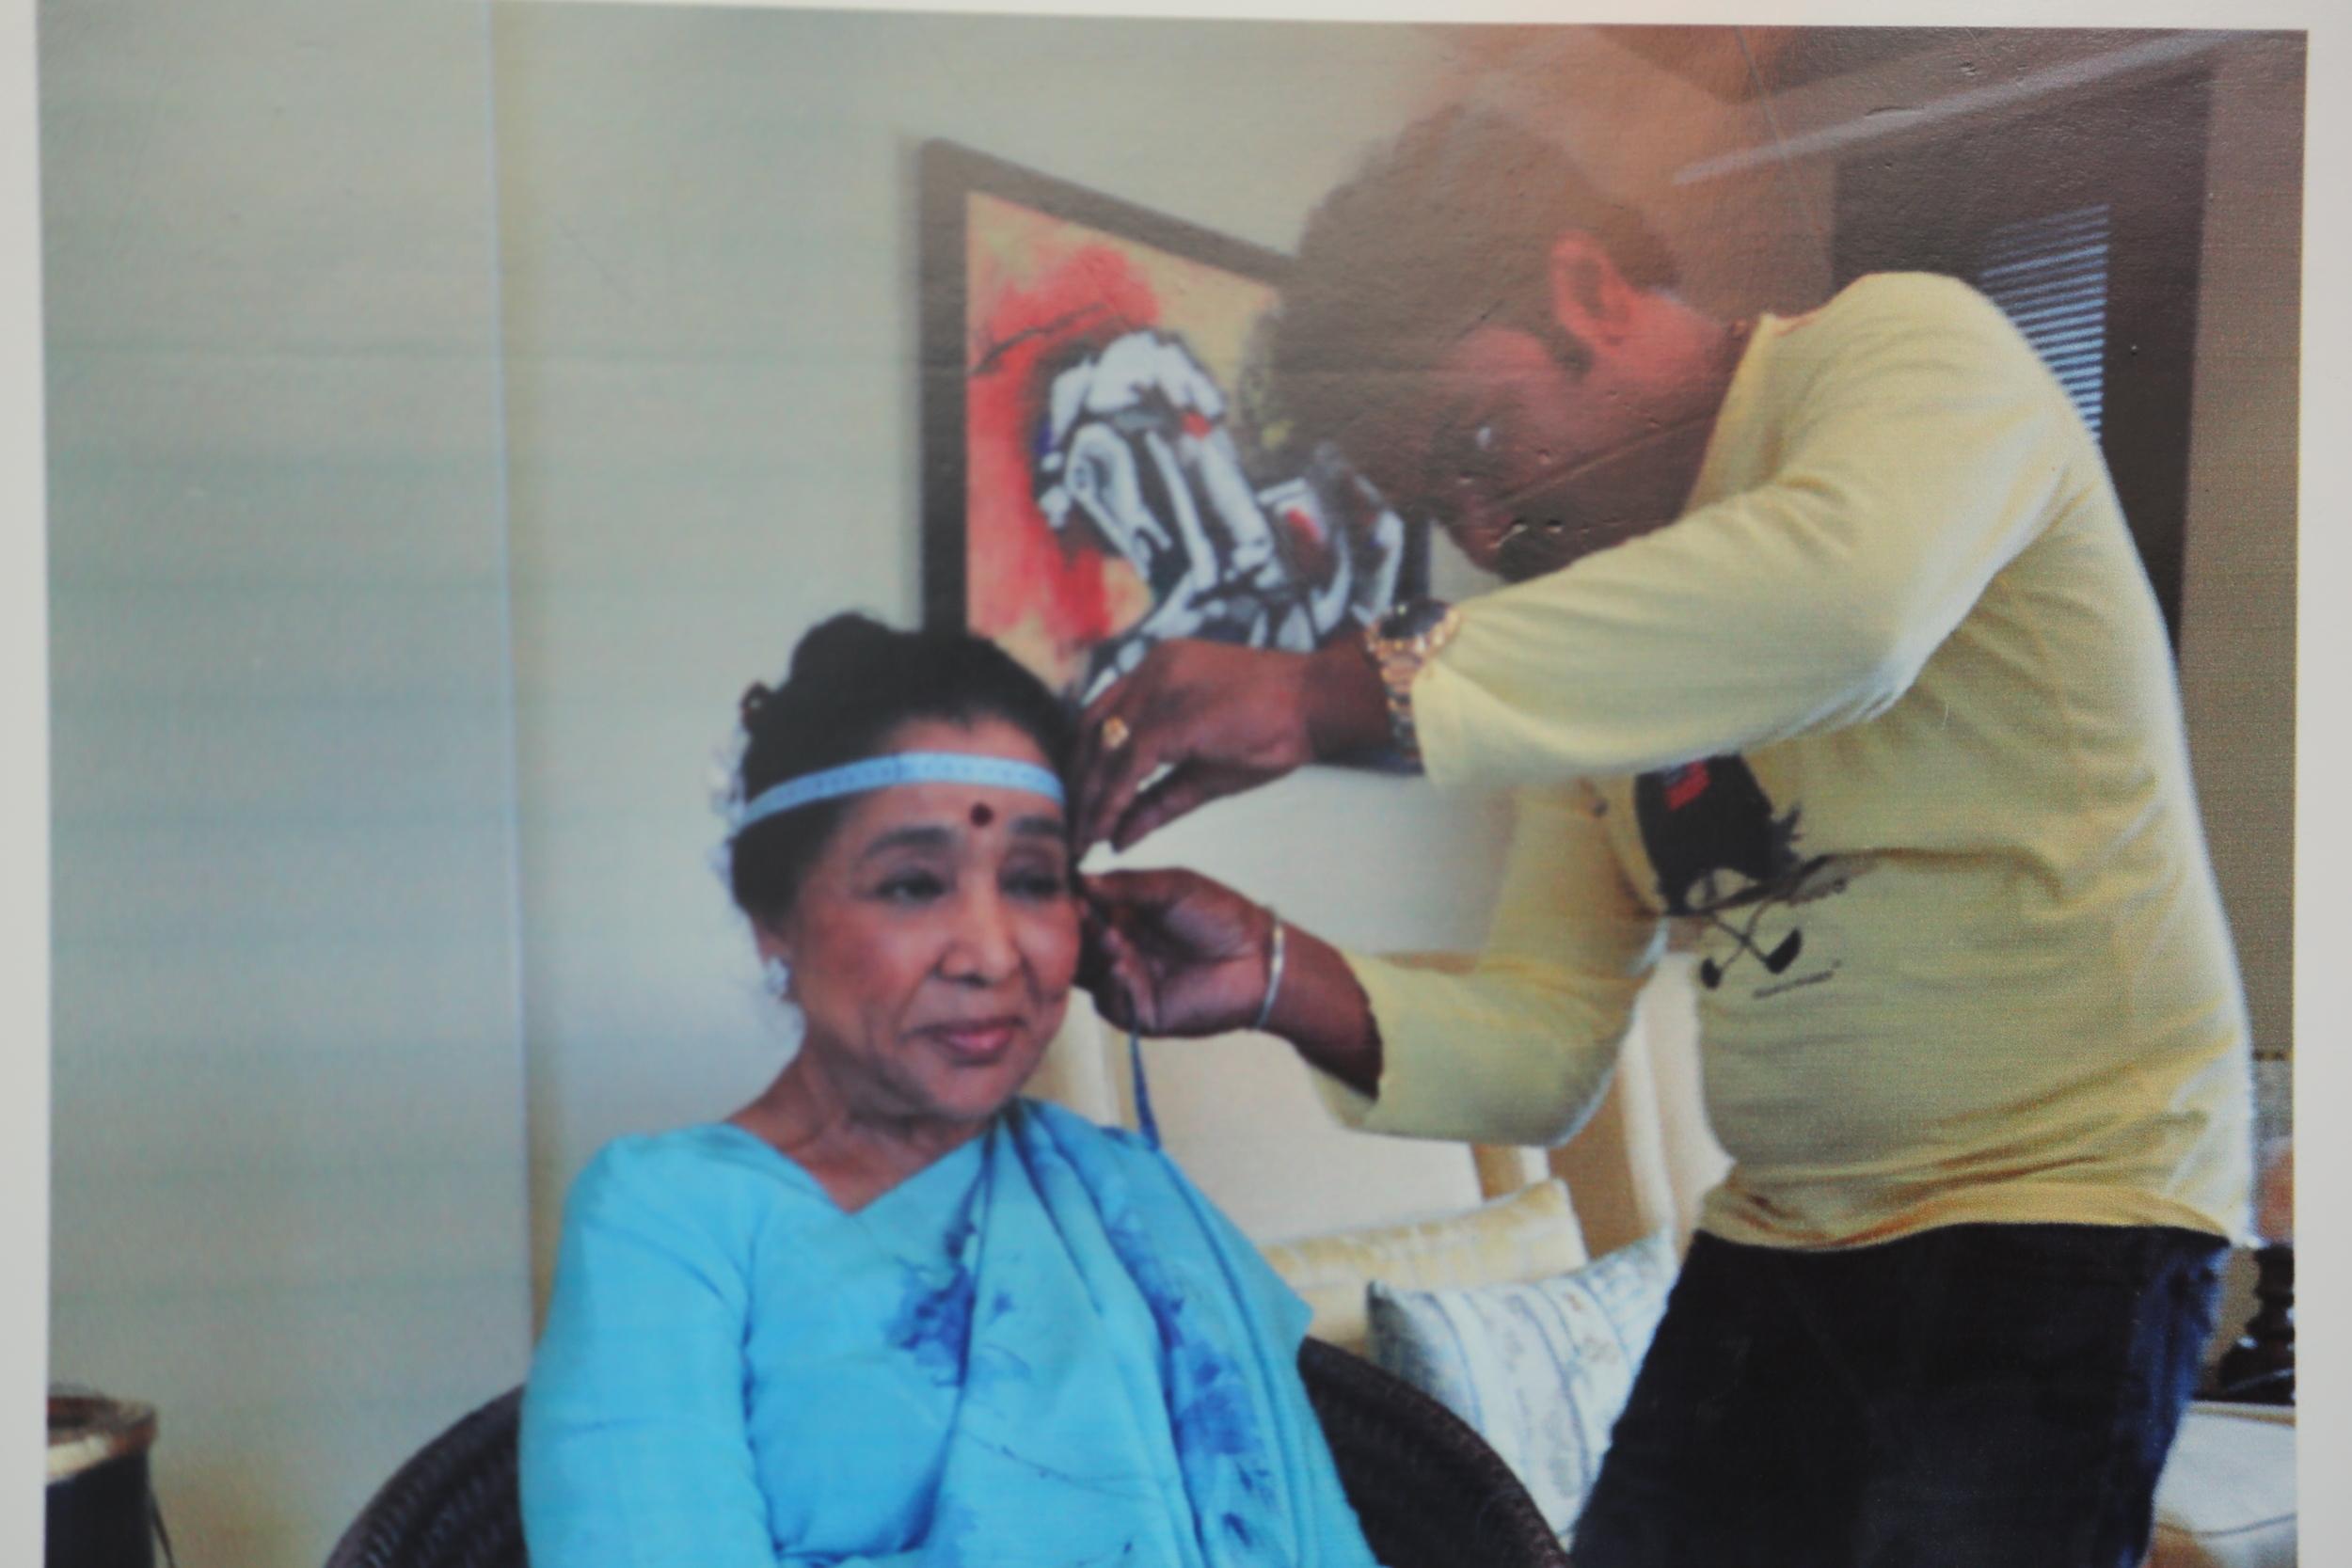 Photo of a photo: Kandalloor measuring Asha Bhosle's head for a wax statute.